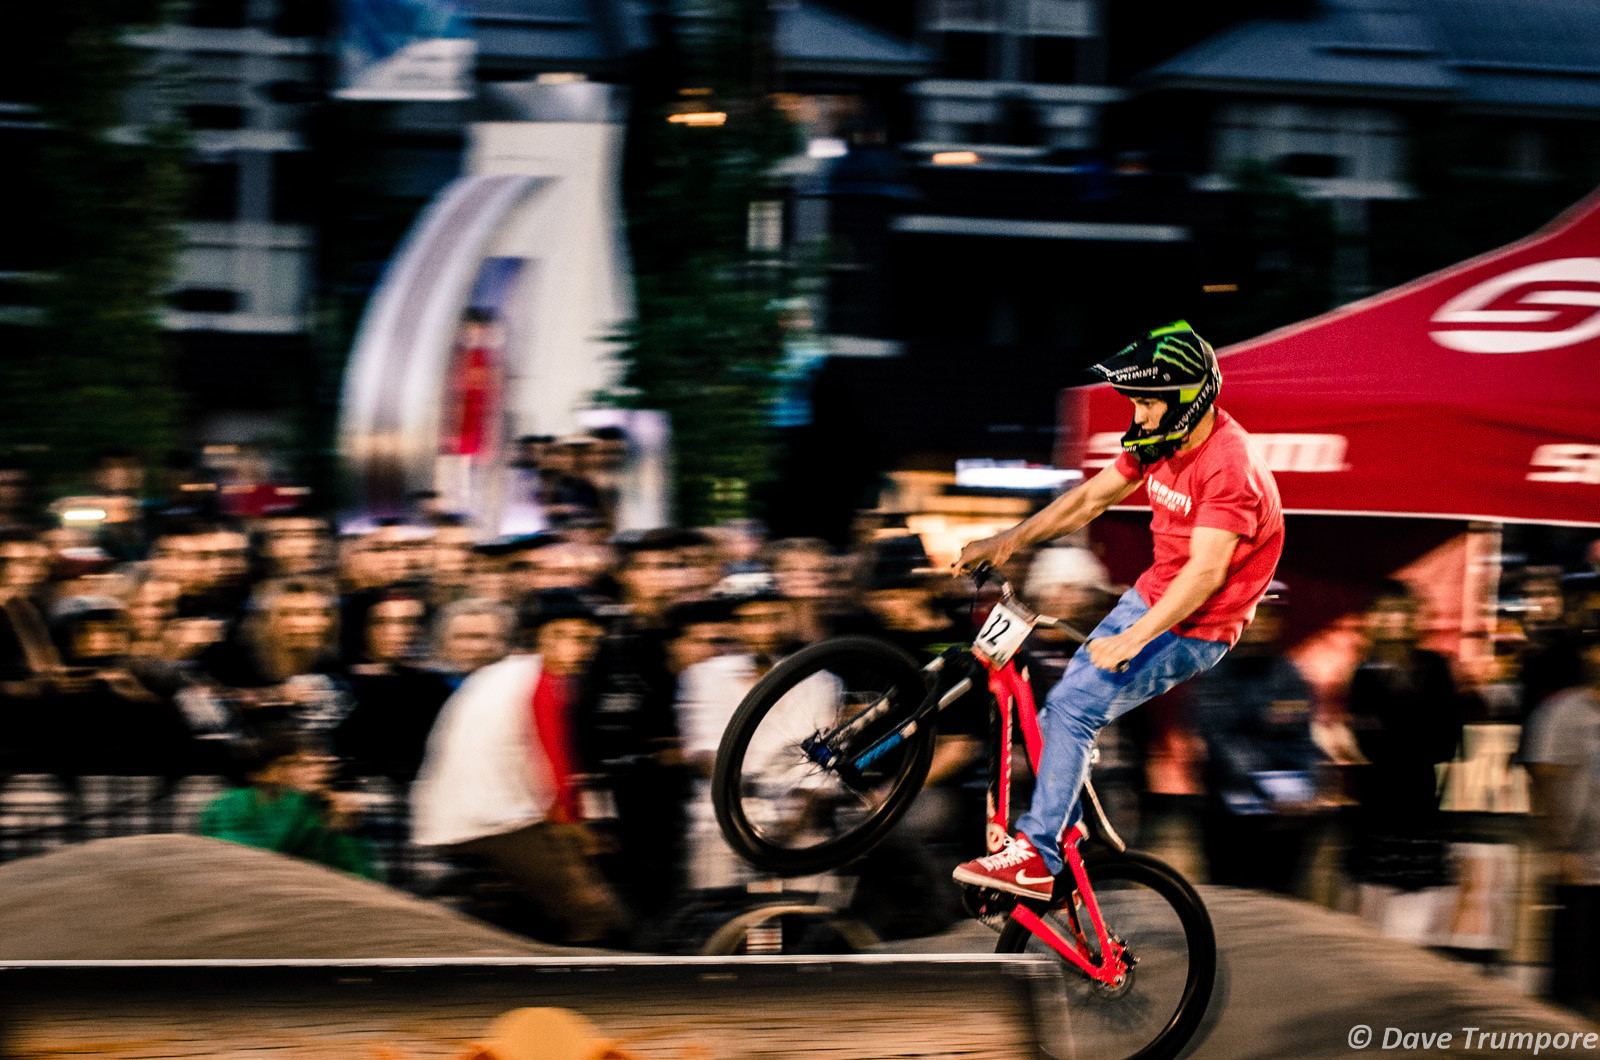 Mitch Ropelato - Crankworx Ultimate Pumptrack Challenge Action - Mountain Biking Pictures - Vital MTB